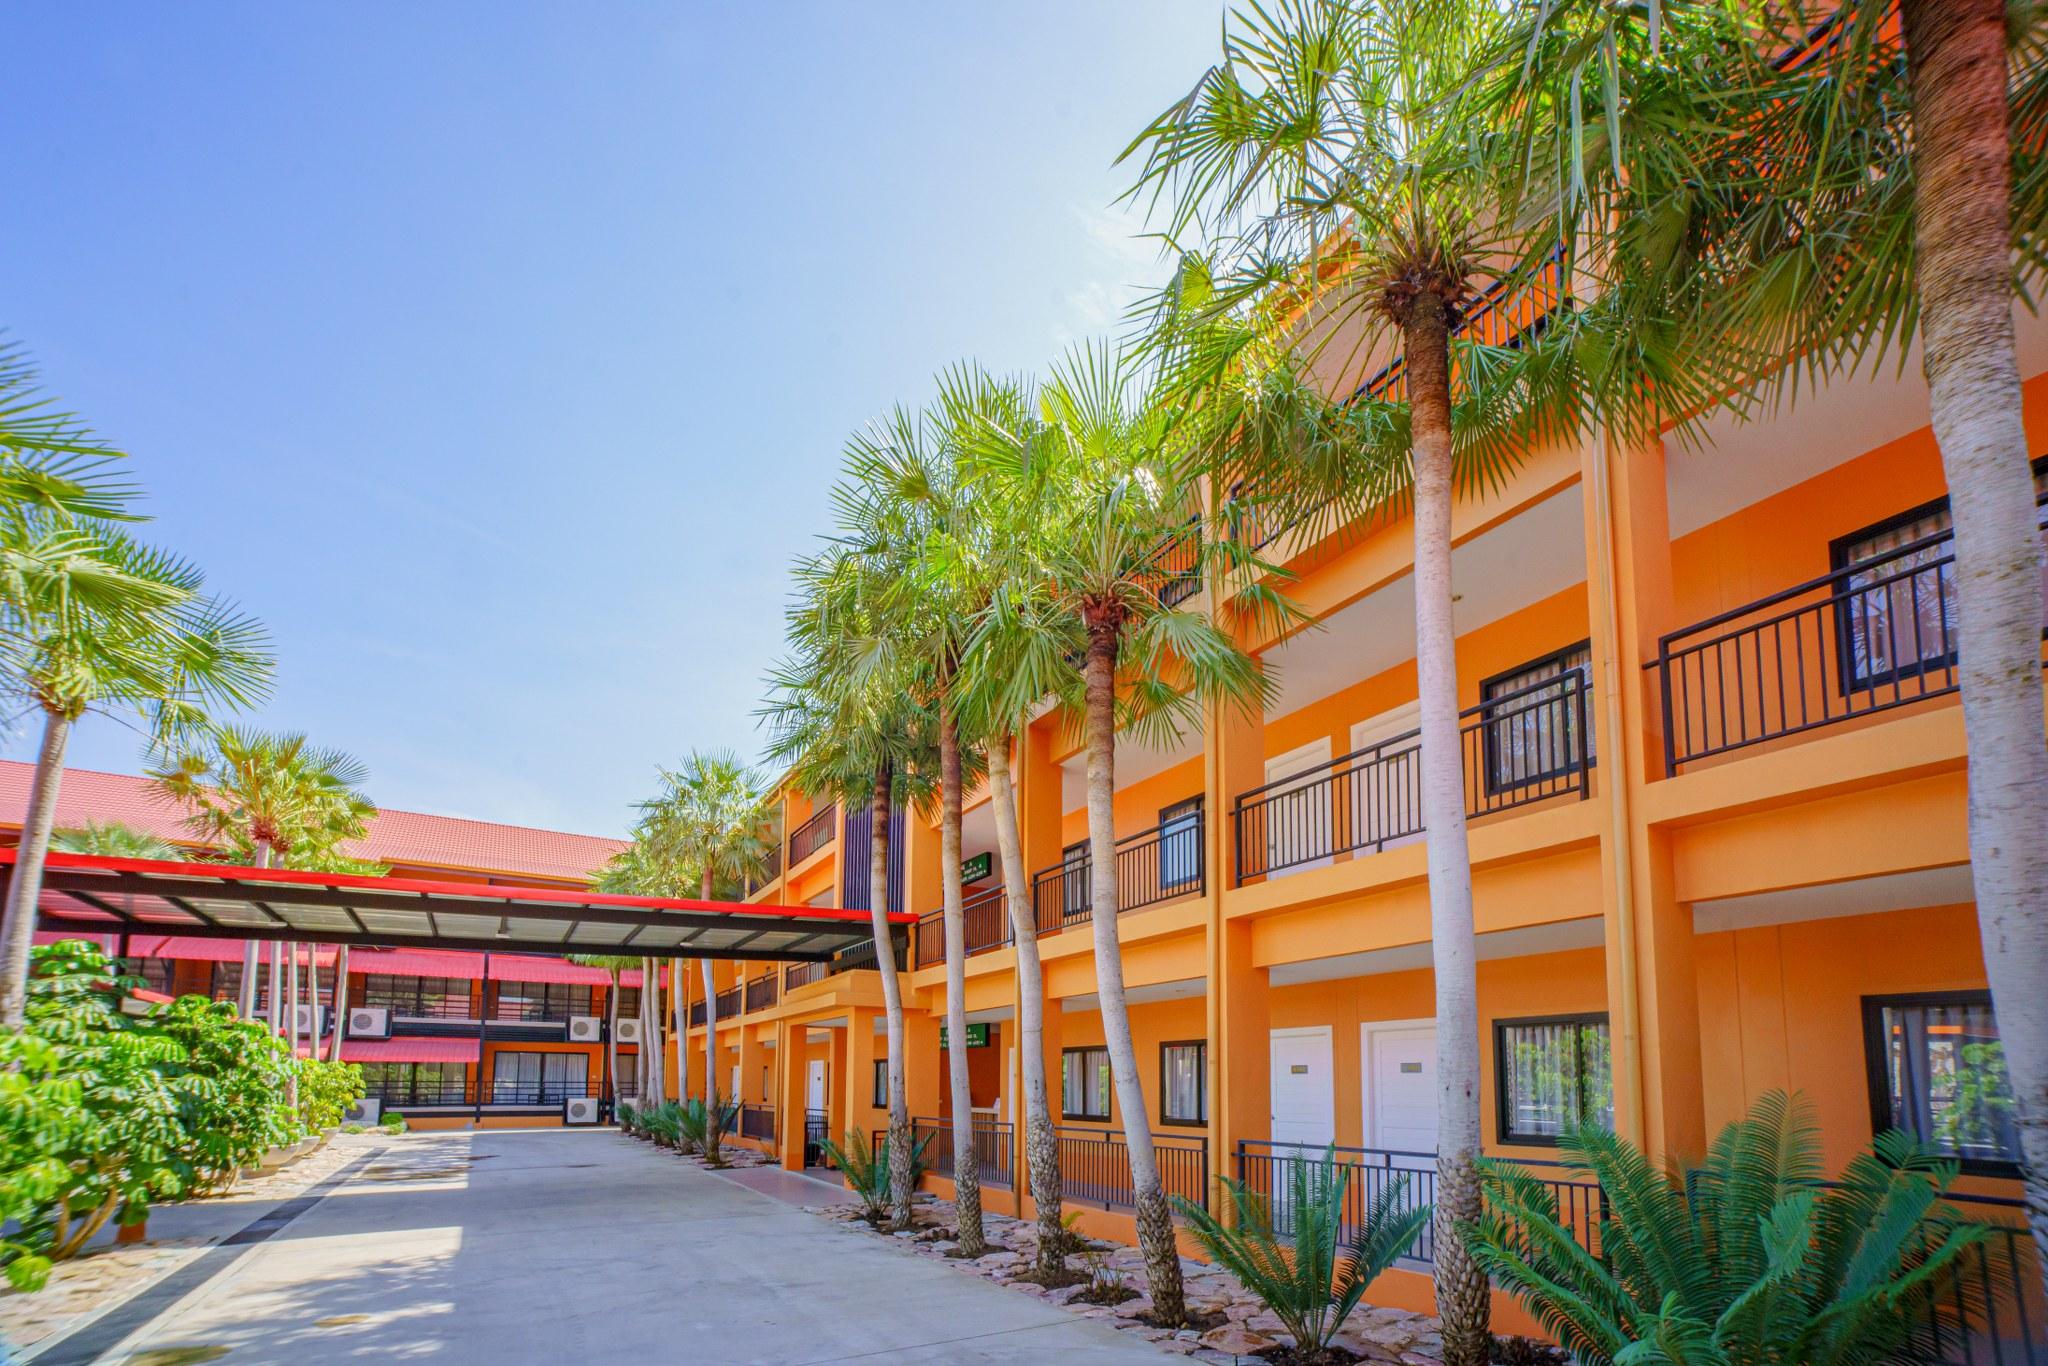 Nongnooch tradition resort Building A